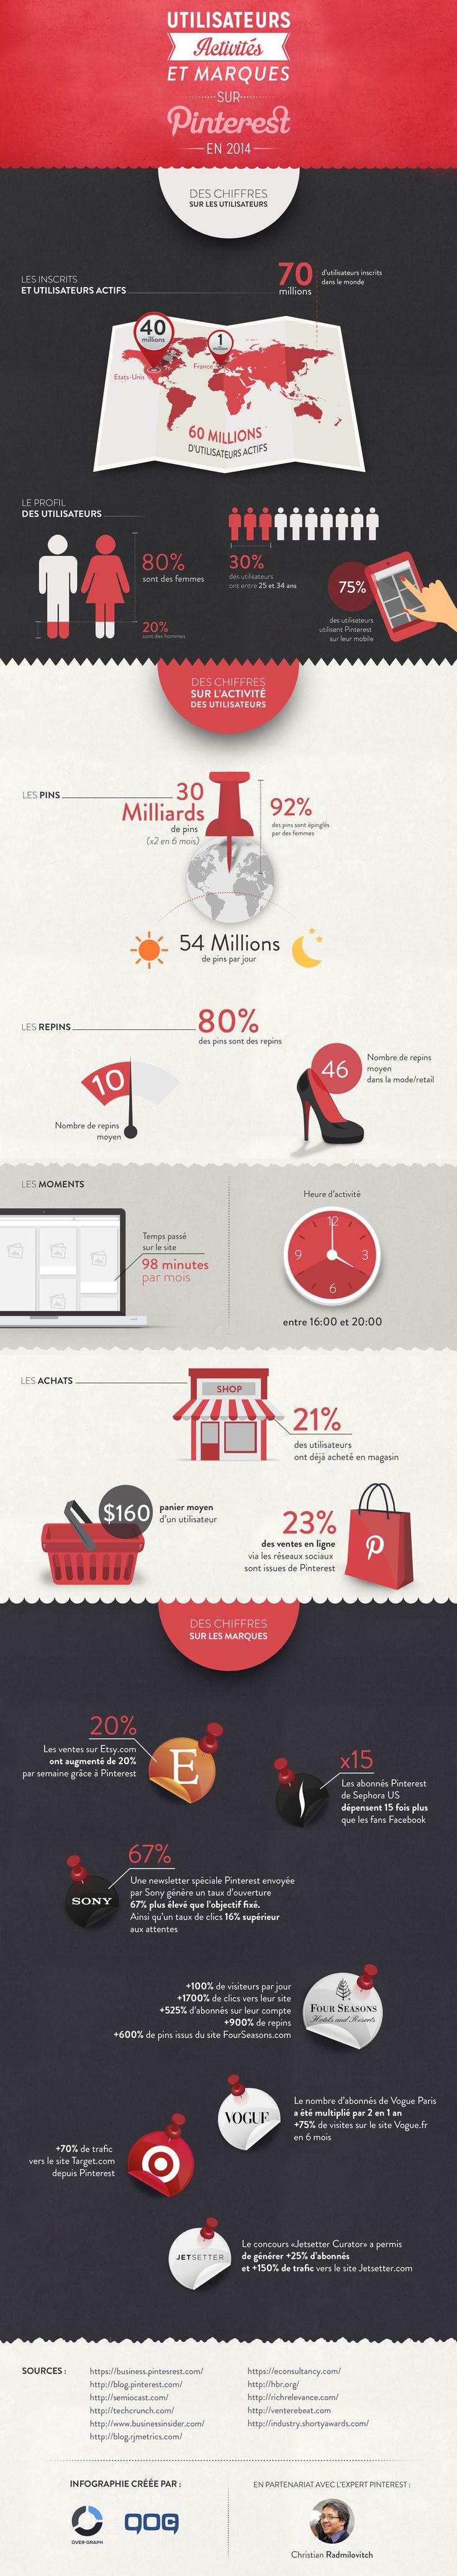 infographie-pinterest-1